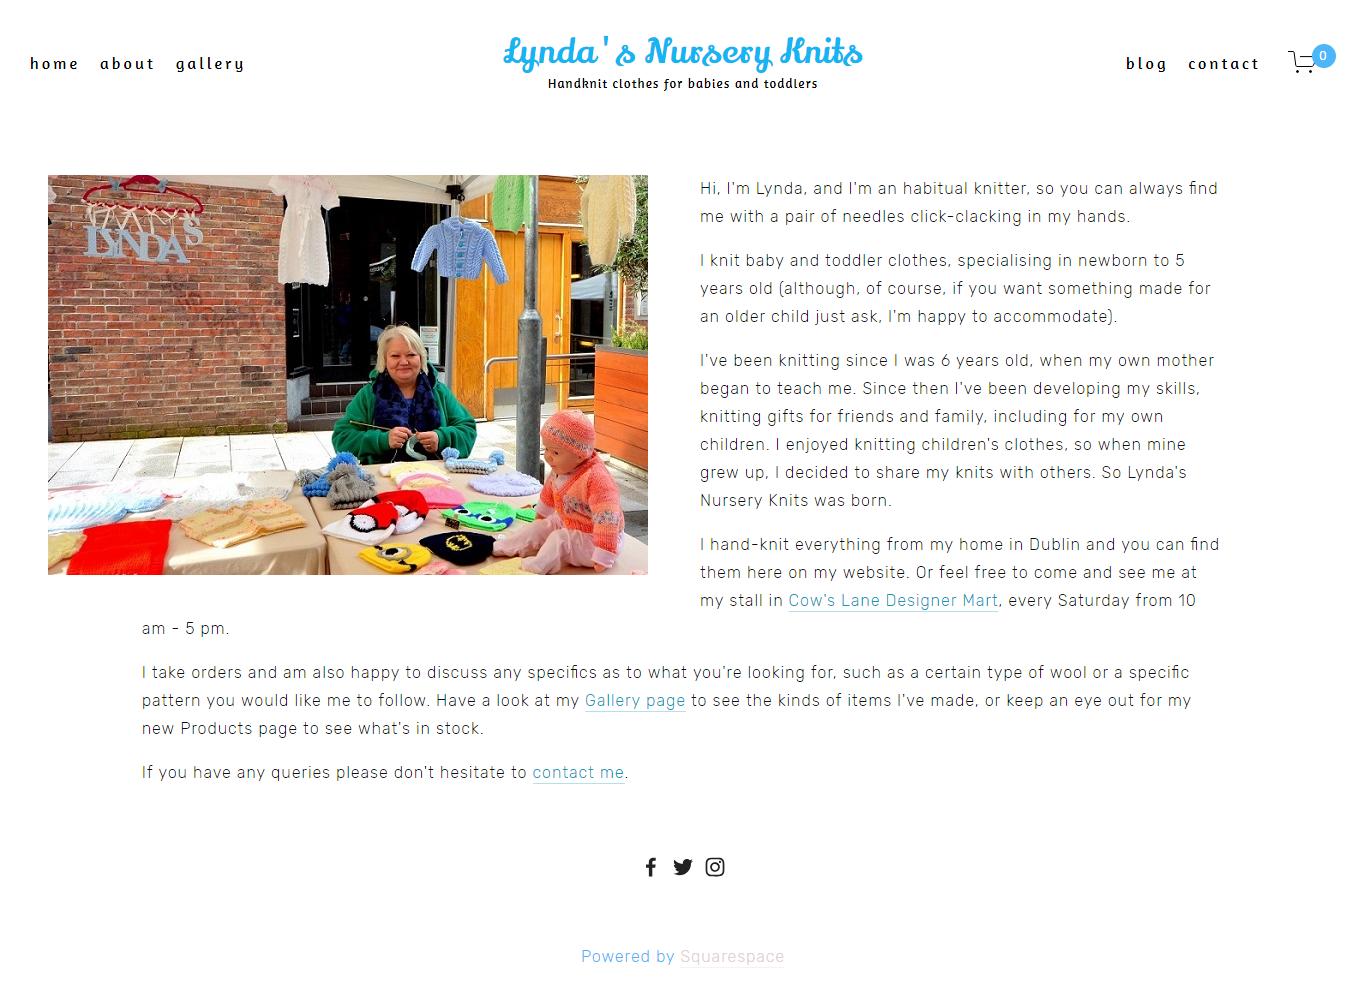 Lynda's Nursery Knits About Page -